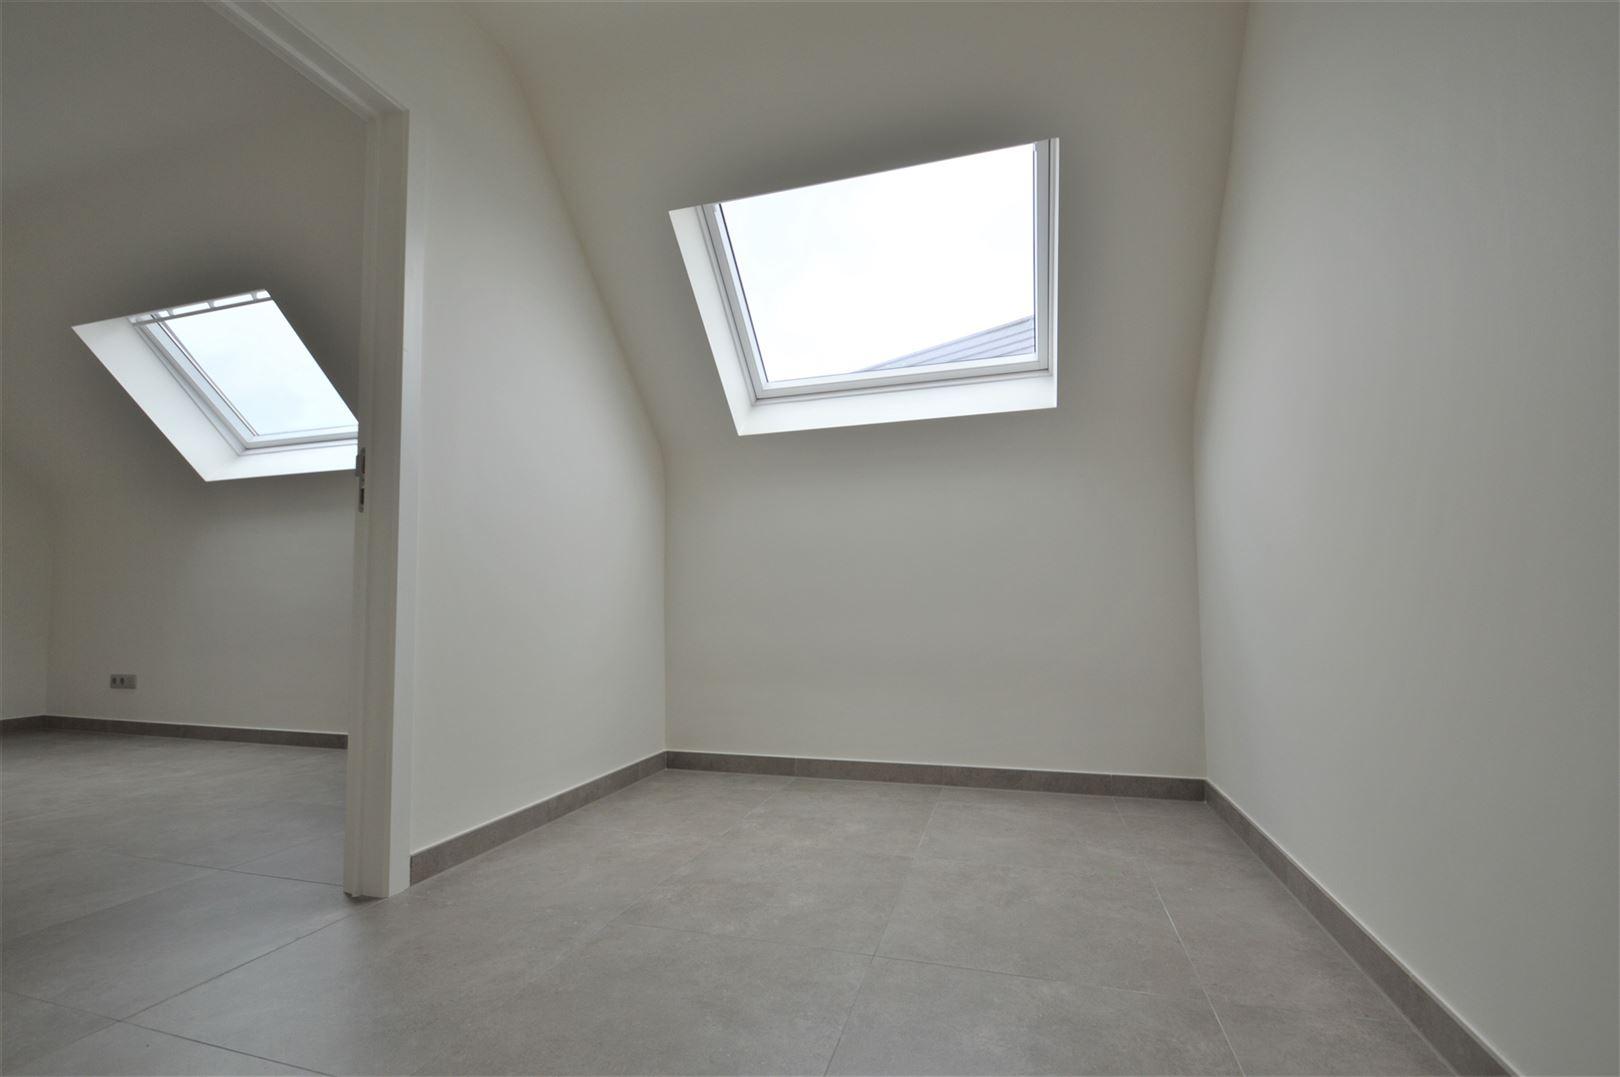 Foto 9 : Huis te 9200 APPELS (België) - Prijs € 950